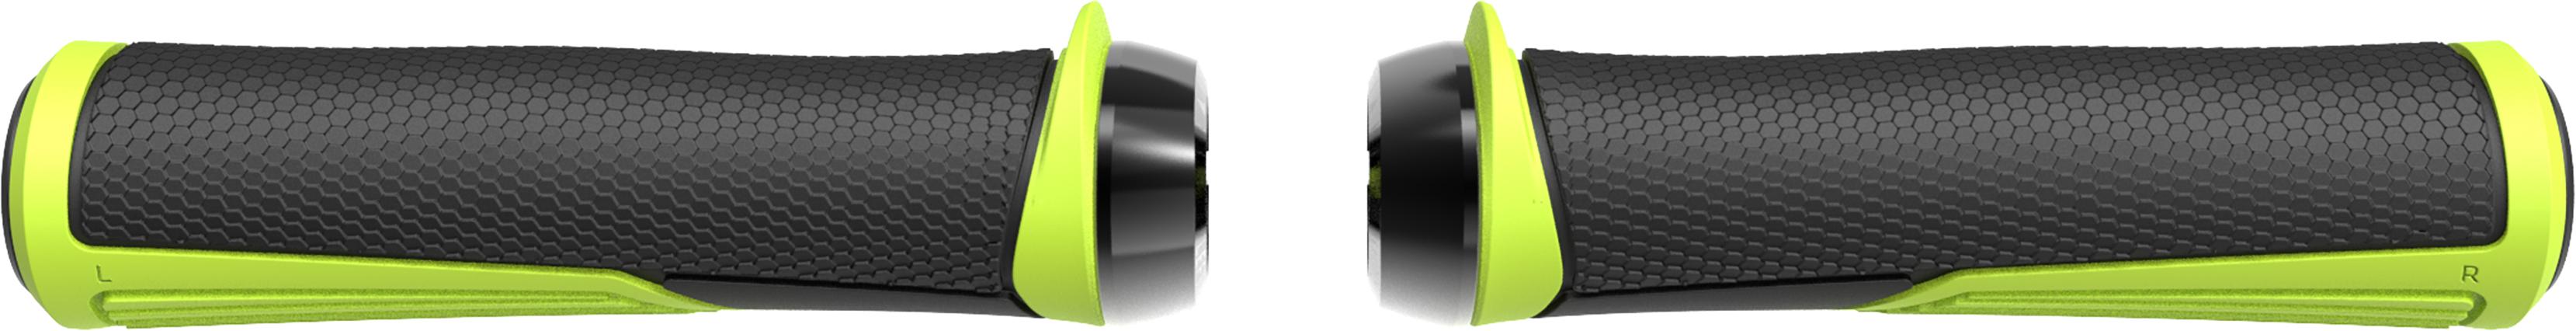 Грипсы BBB Cobra 142mm неон желтый/черный, Рулевая группа - арт. 1022140362